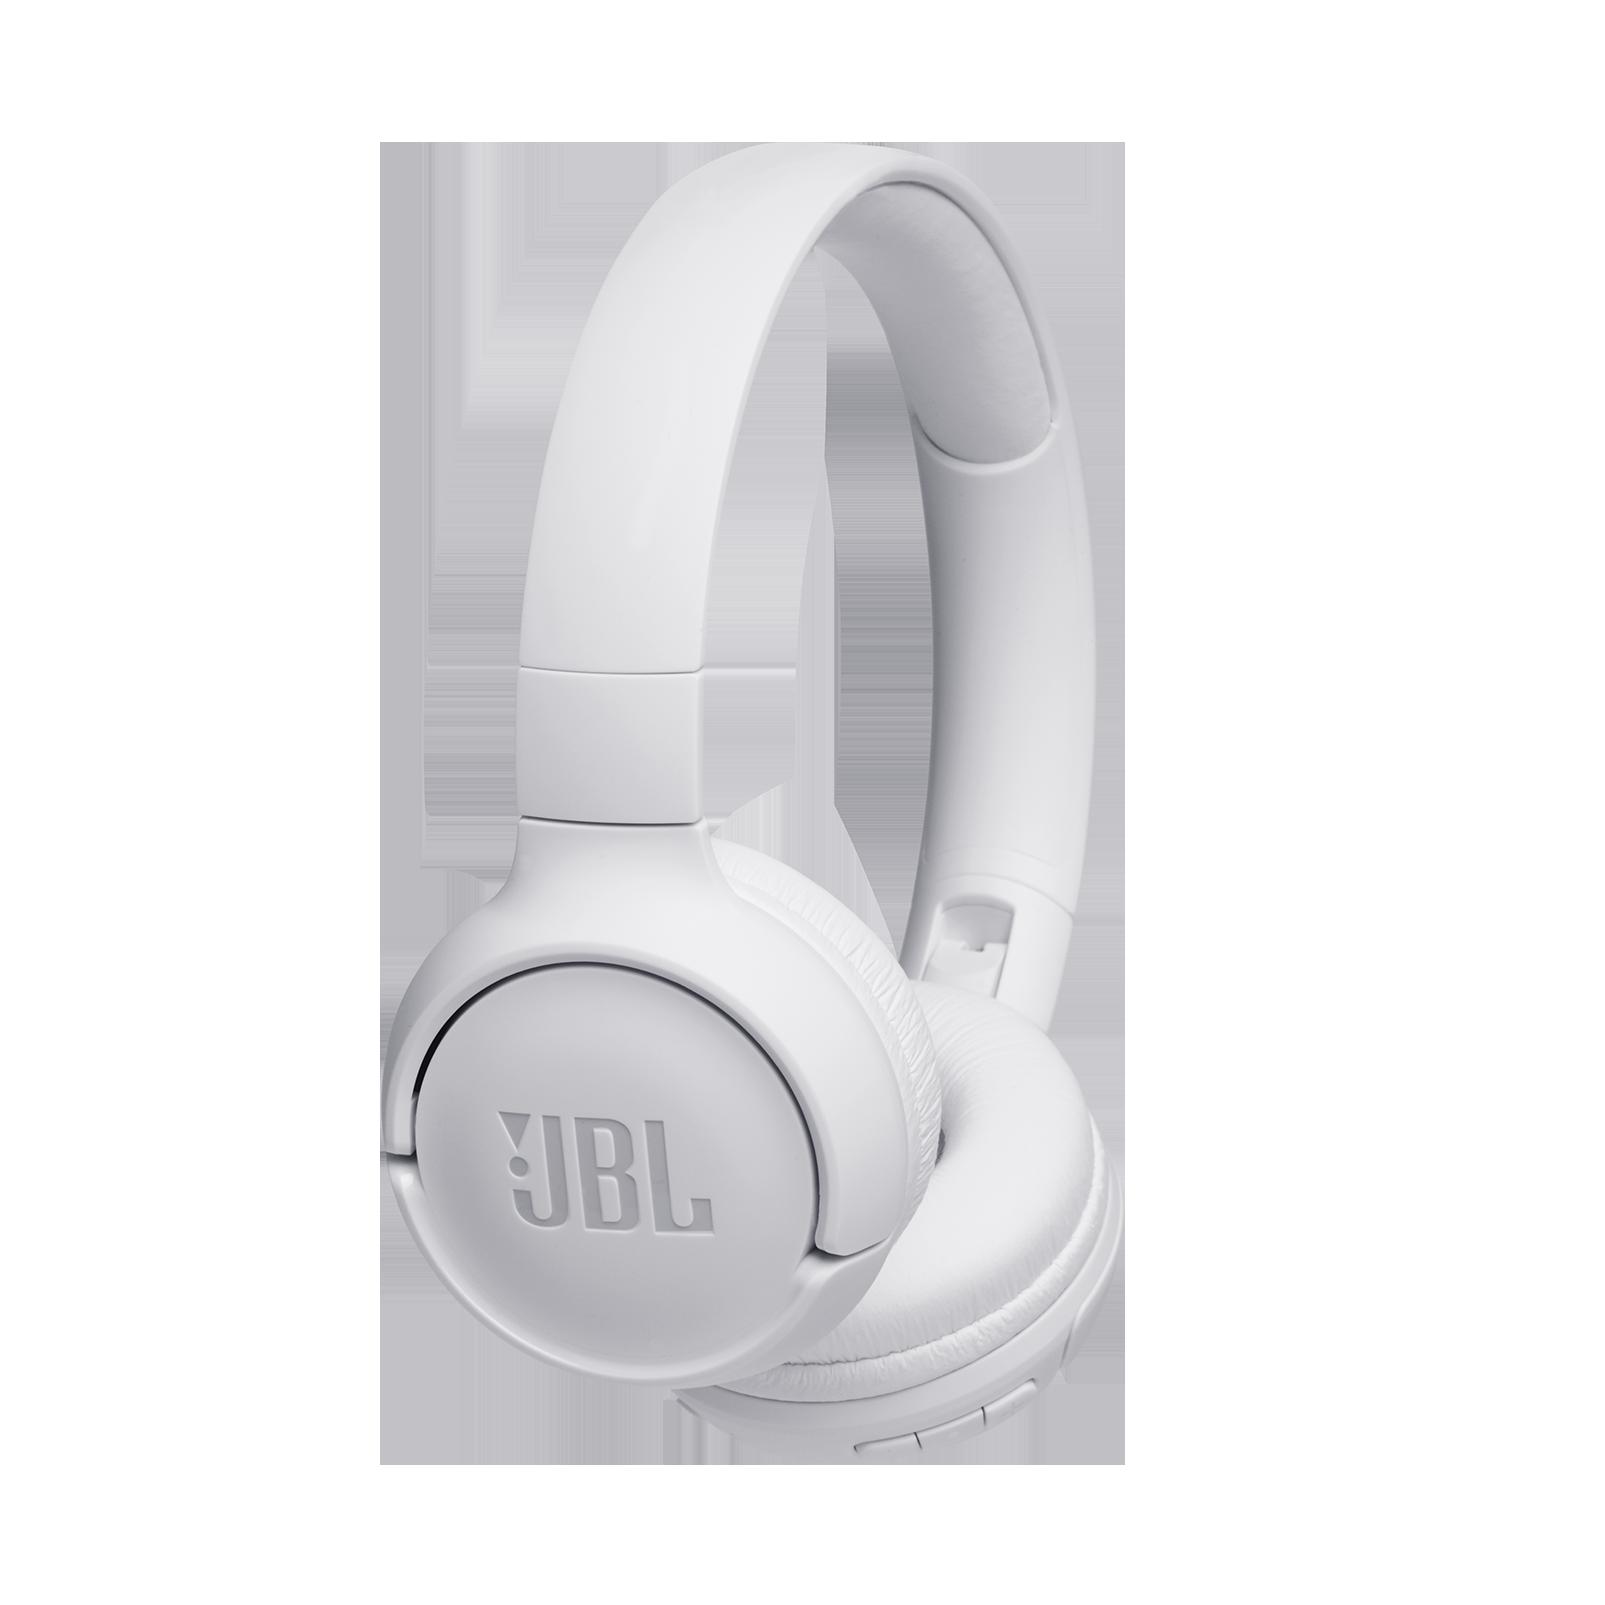 JBL TUNE 560BT - White - Wireless on-ear headphones - Hero